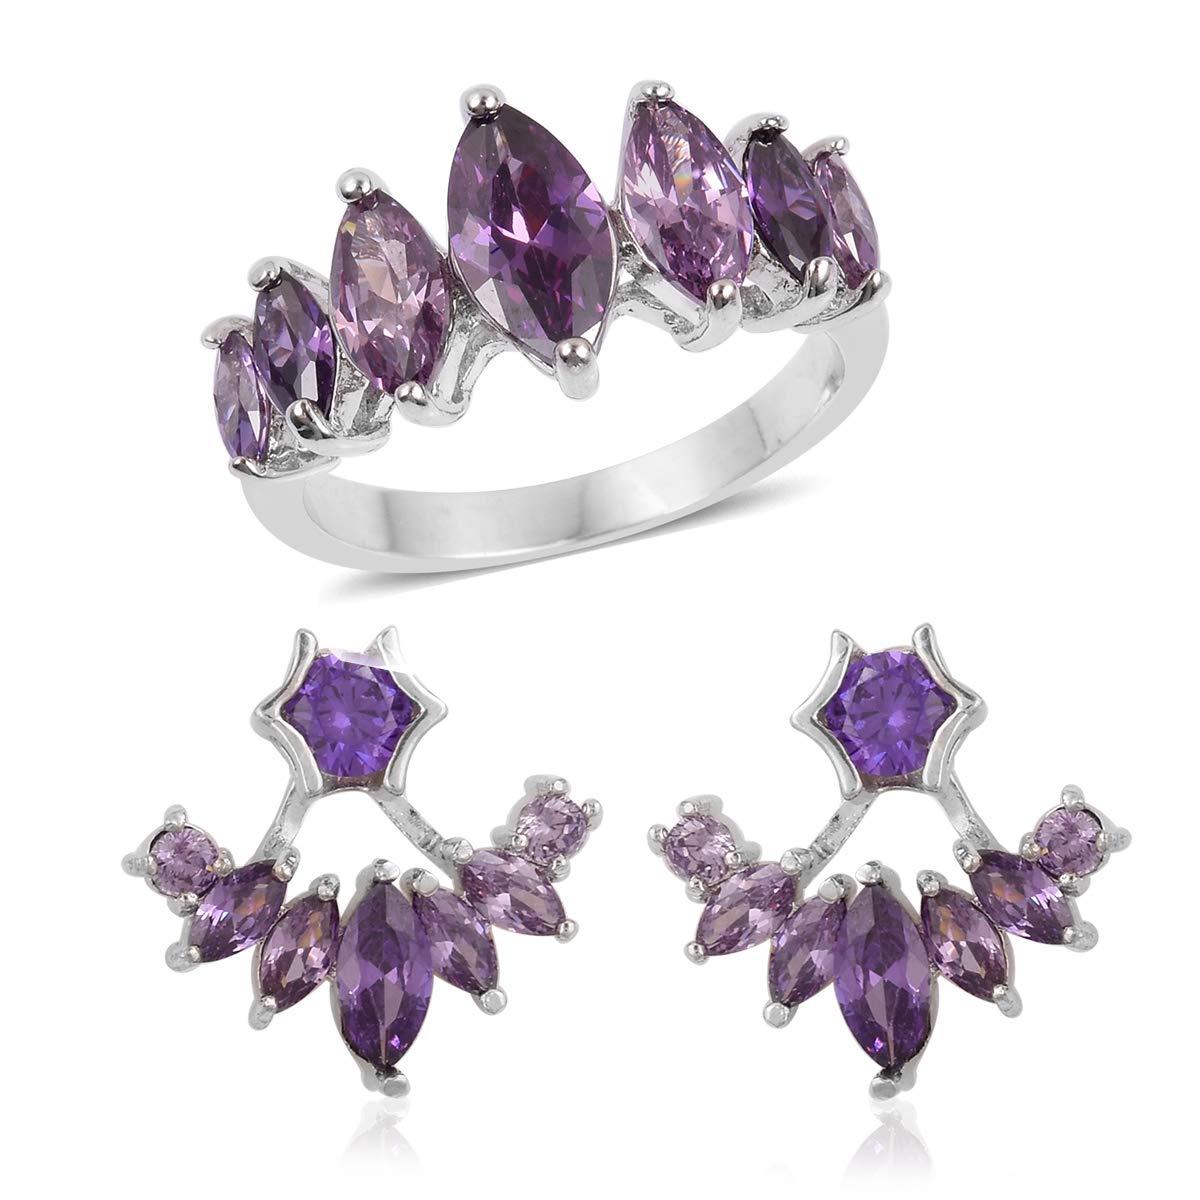 Shop LC Round Cubic Zircon Silvertone Purple Ring Size 7 Stud Earring Set Cttw 2.9